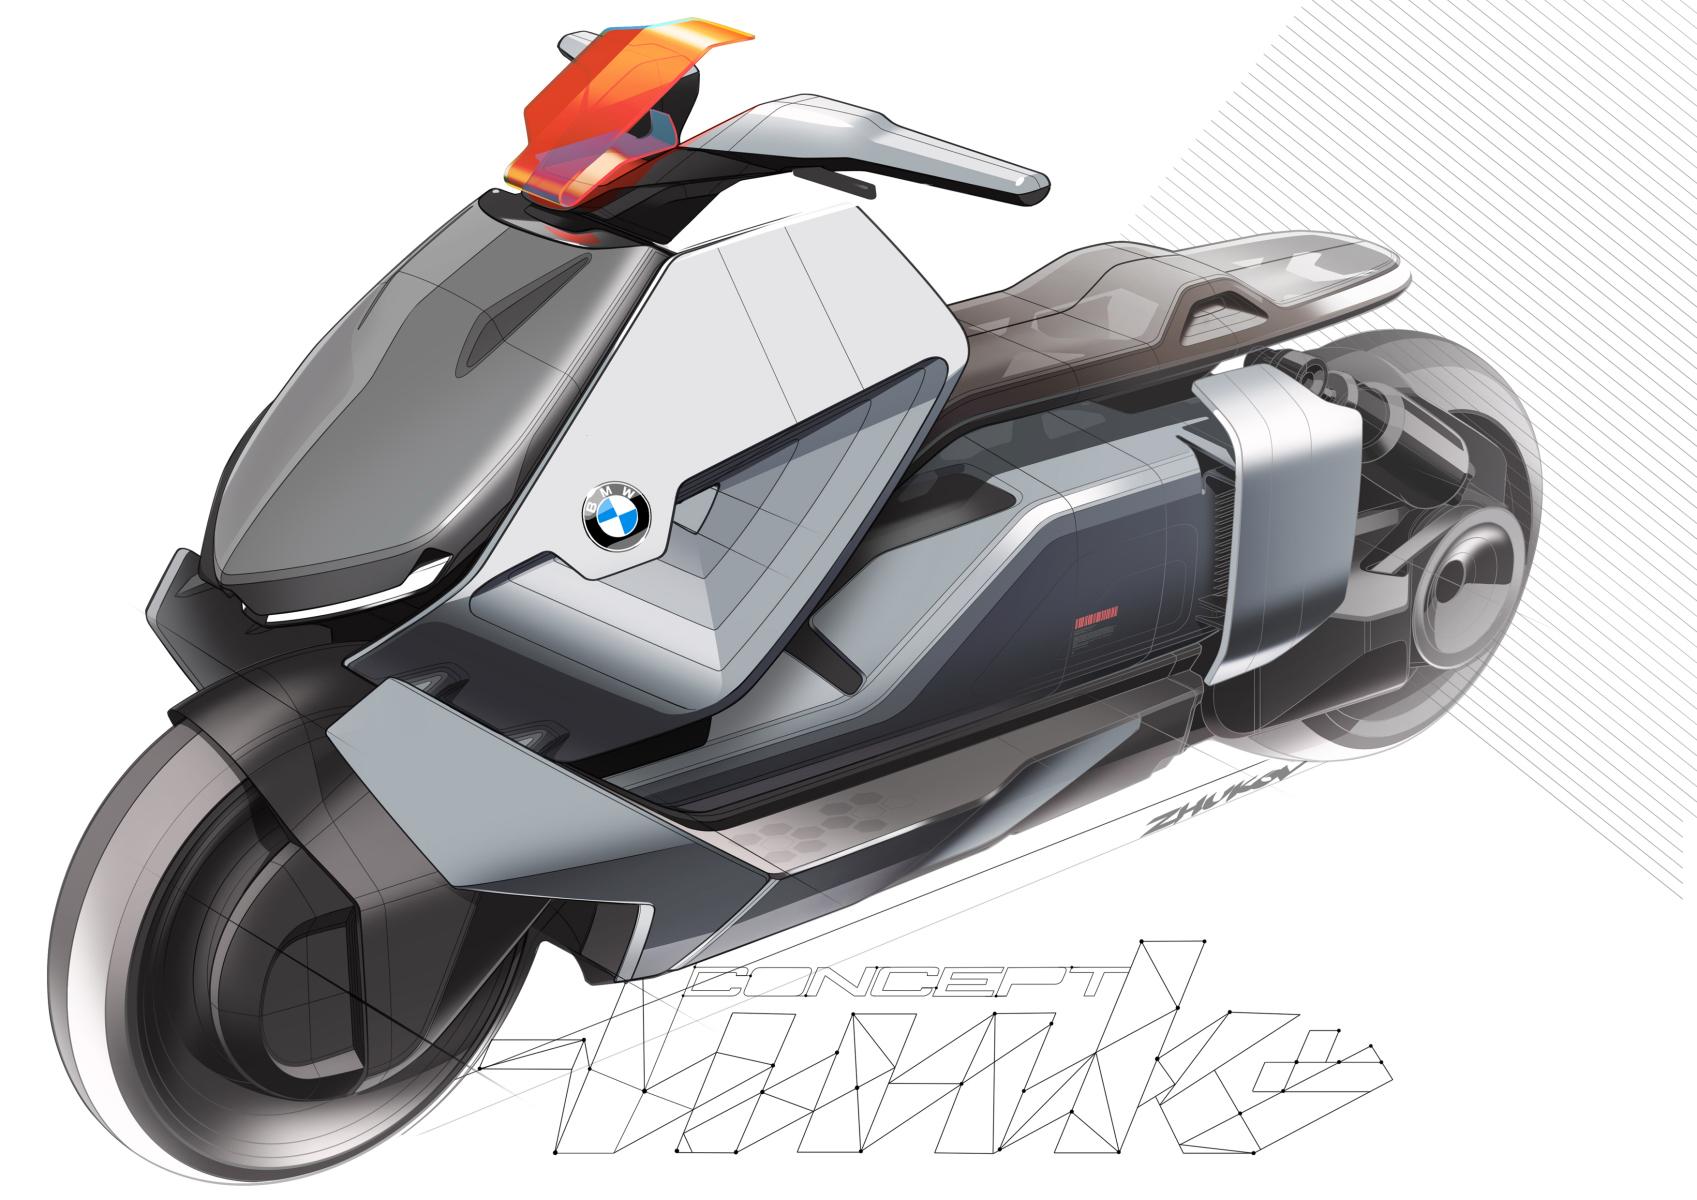 P90260589_highRes_bmw-motorrad-concept_01 拷貝.JPG